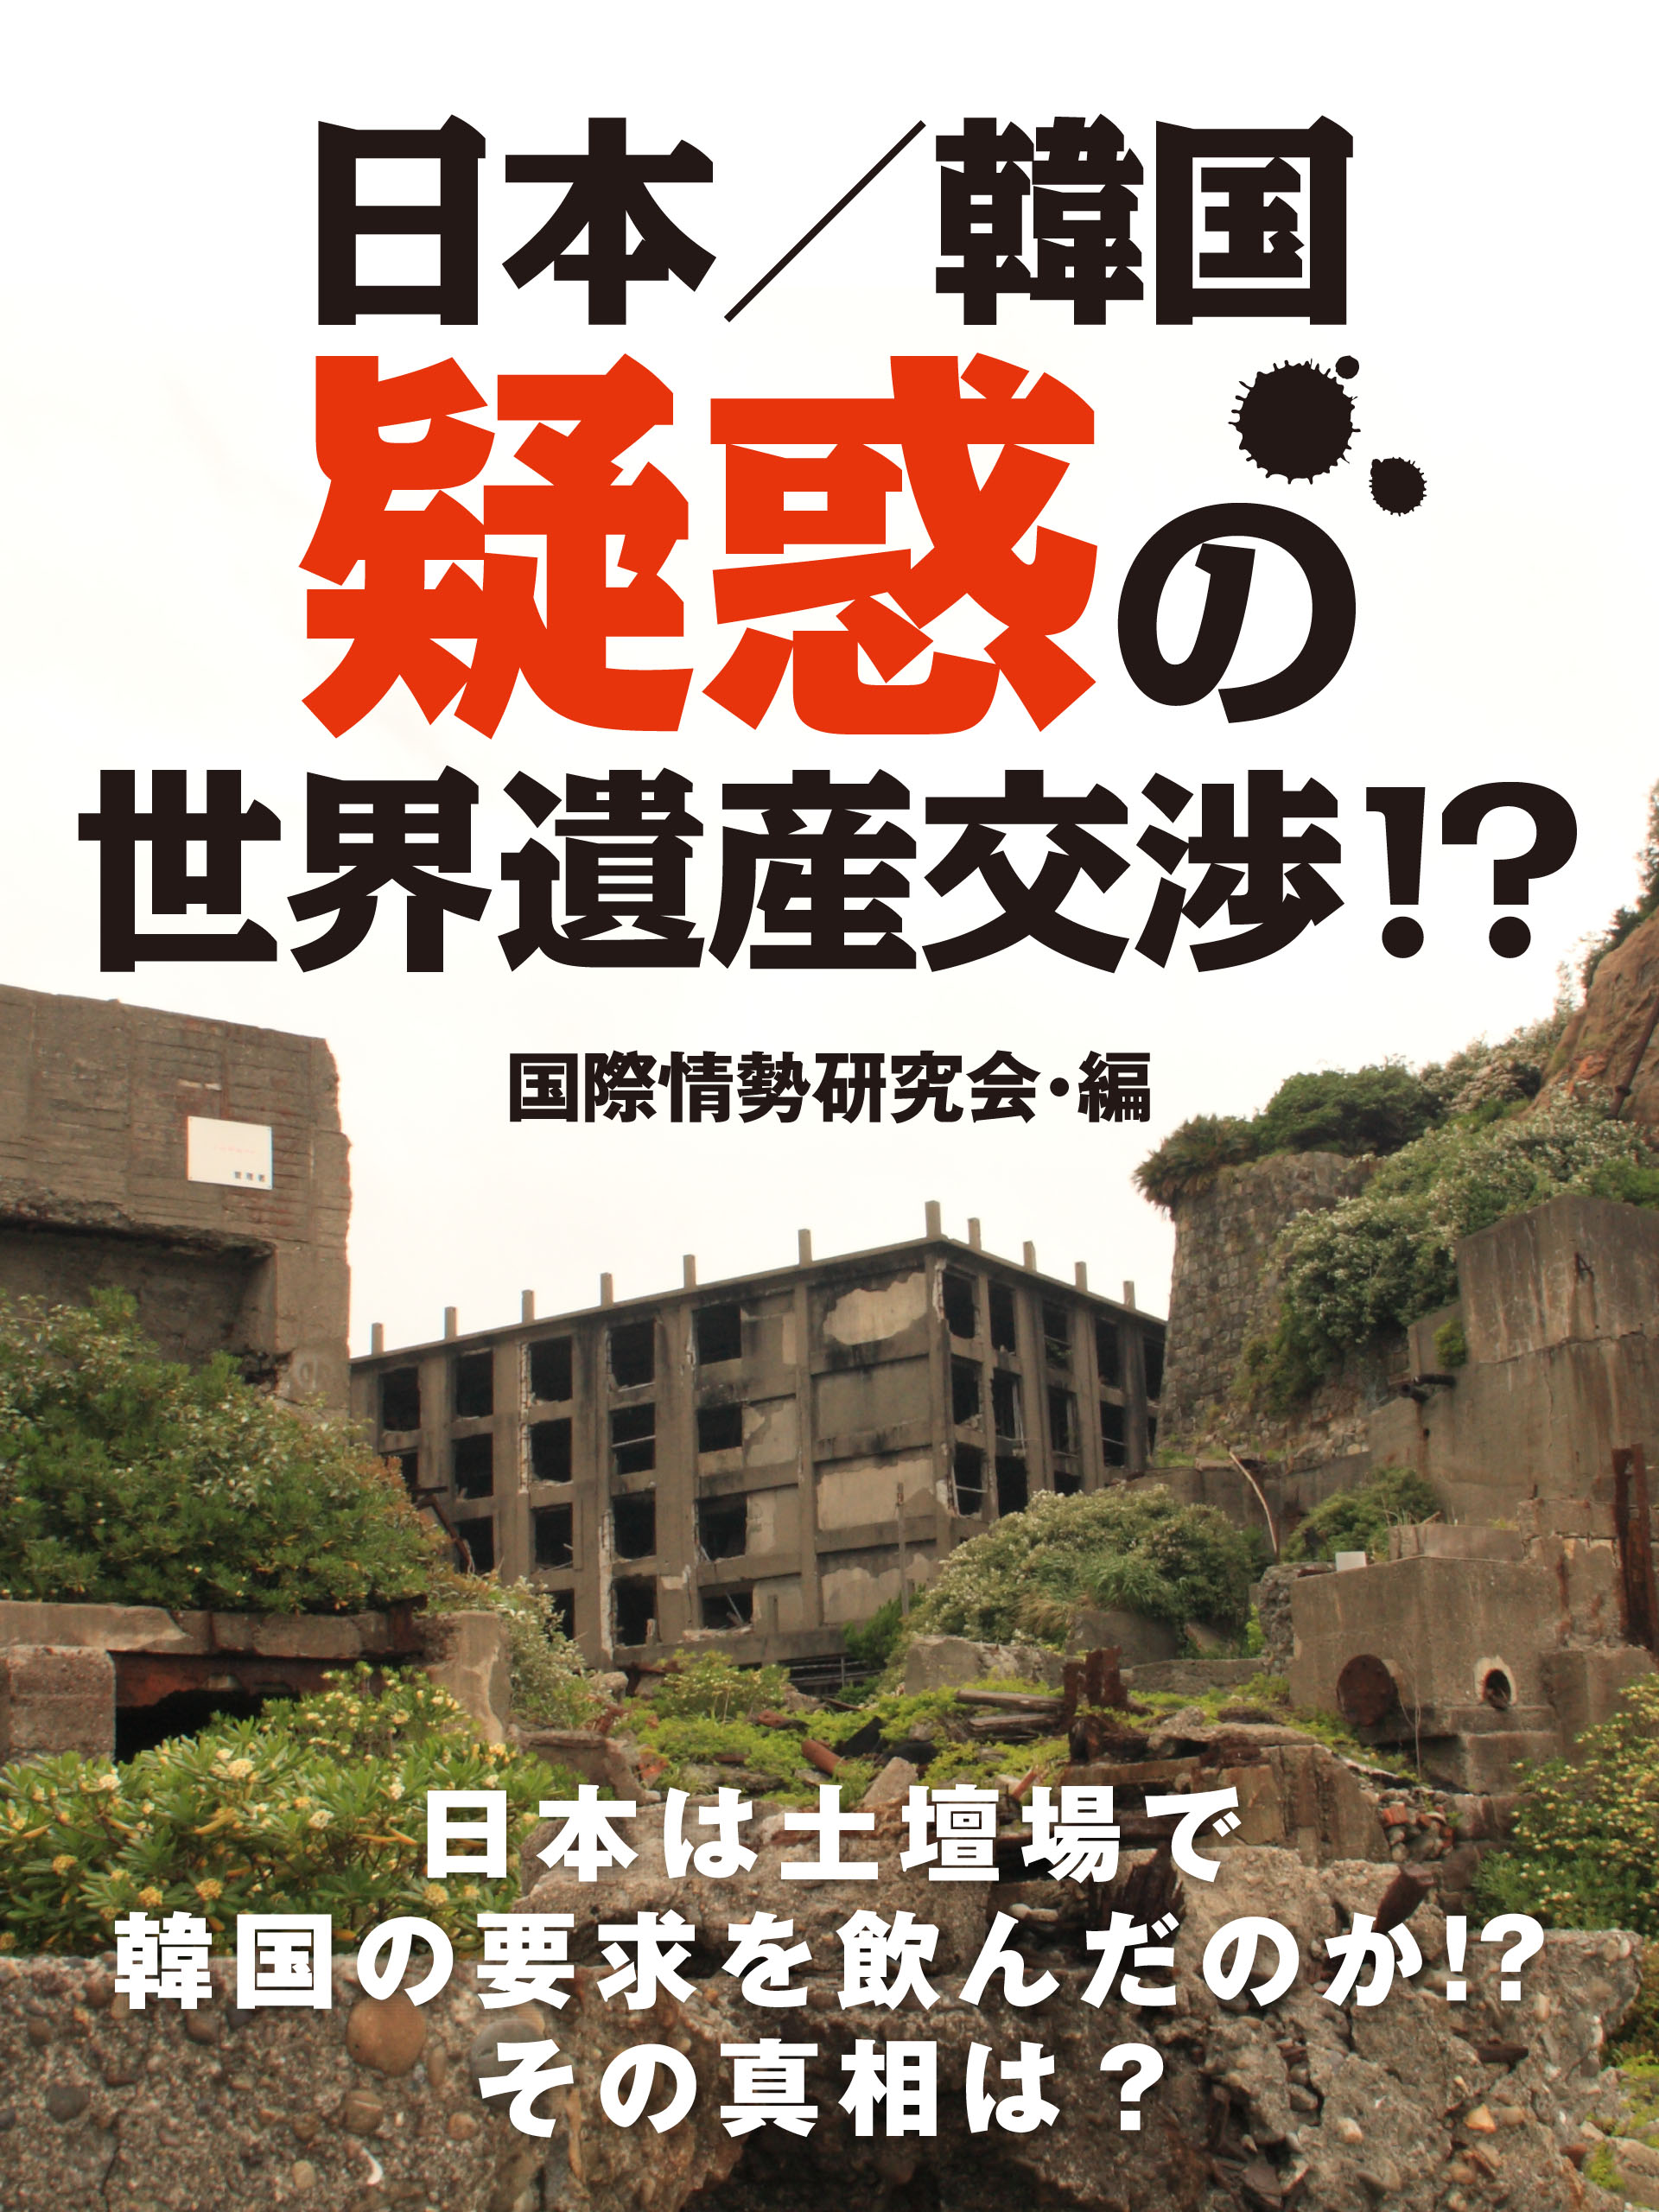 日本/韓国 疑惑の世界遺産交渉!?